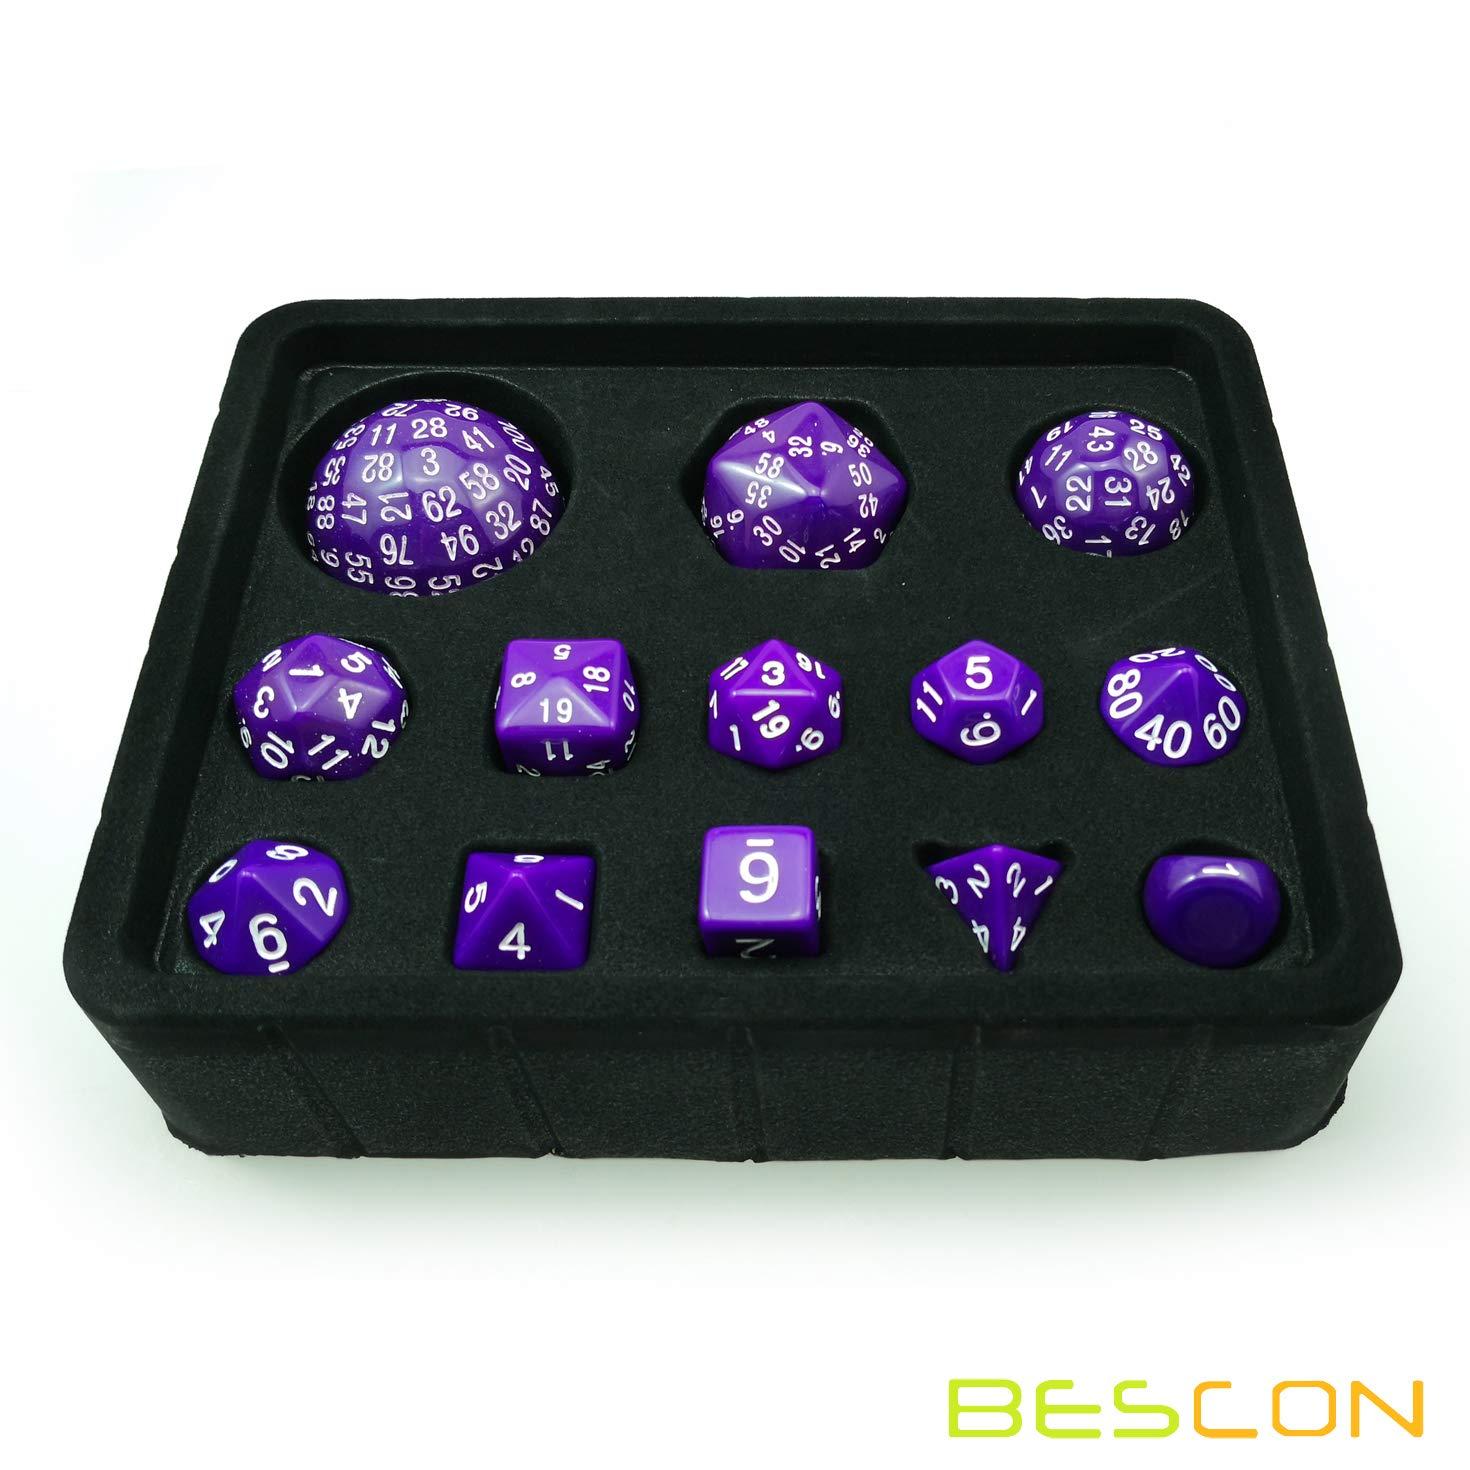 Bescon Complete Polyhedral RPG Dice Set 13pcs D3-D100 100 Sides Dice Set Solid Purple BESCON DICE